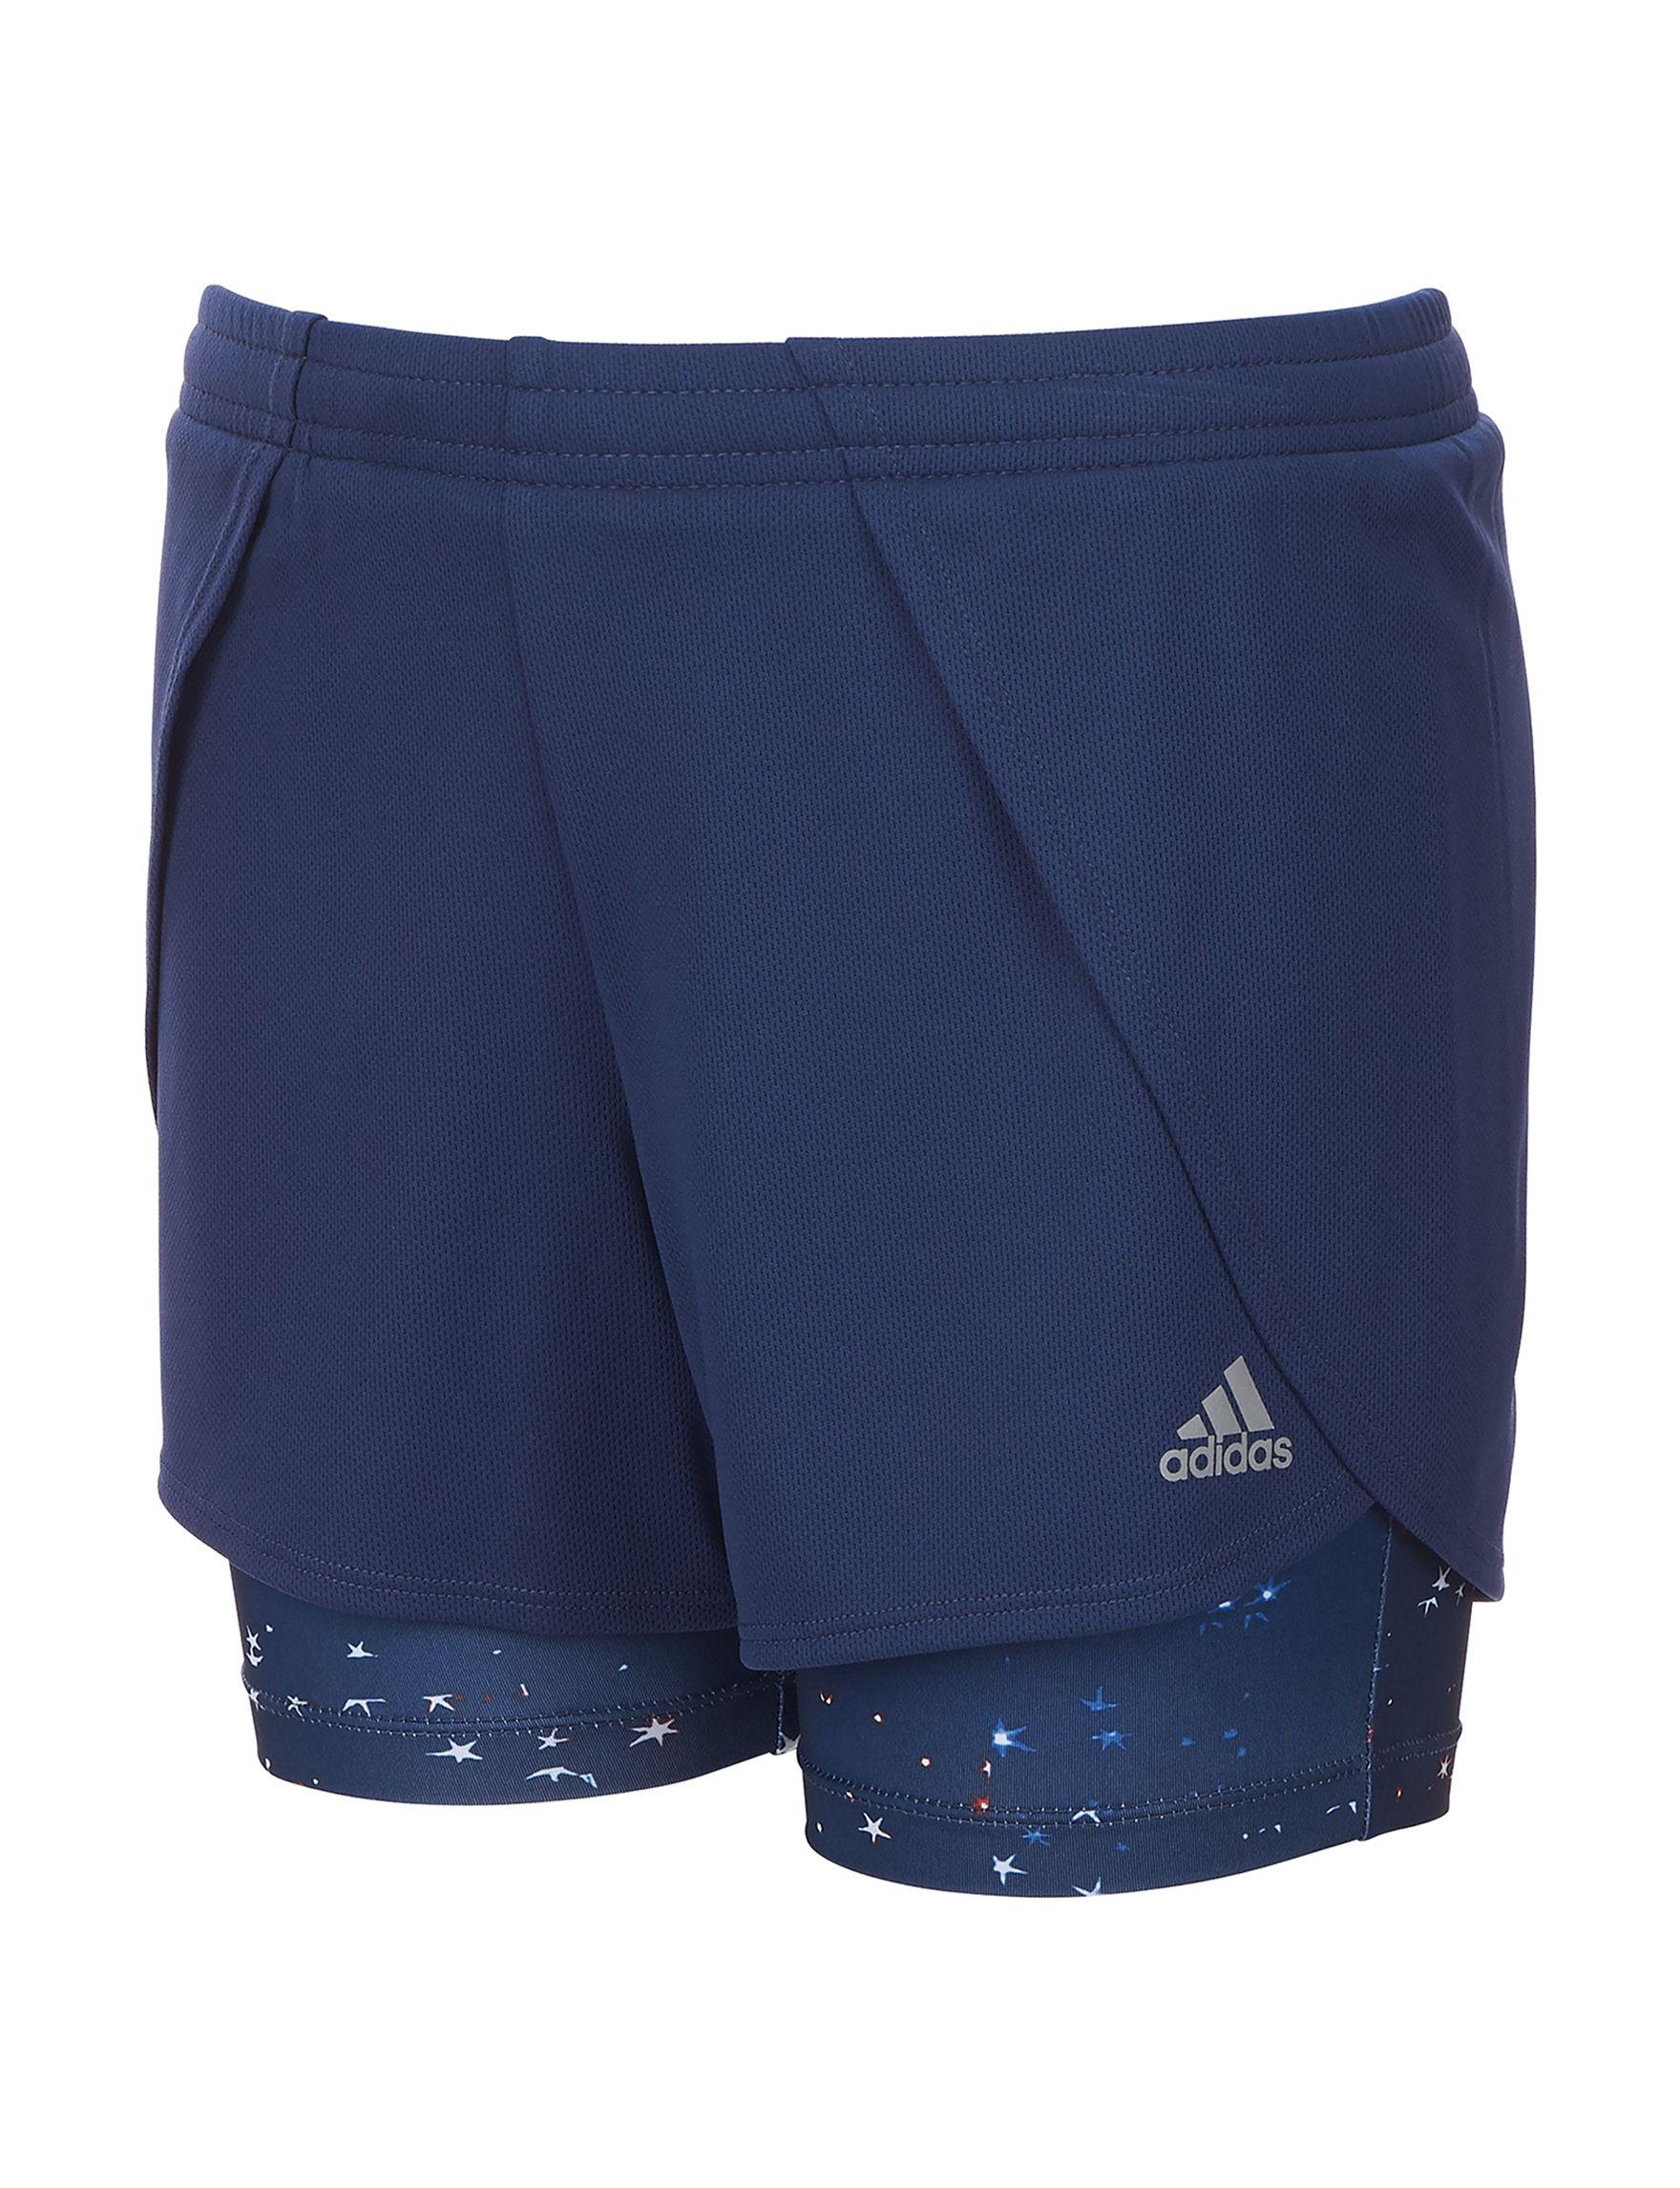 Adidas Indigo